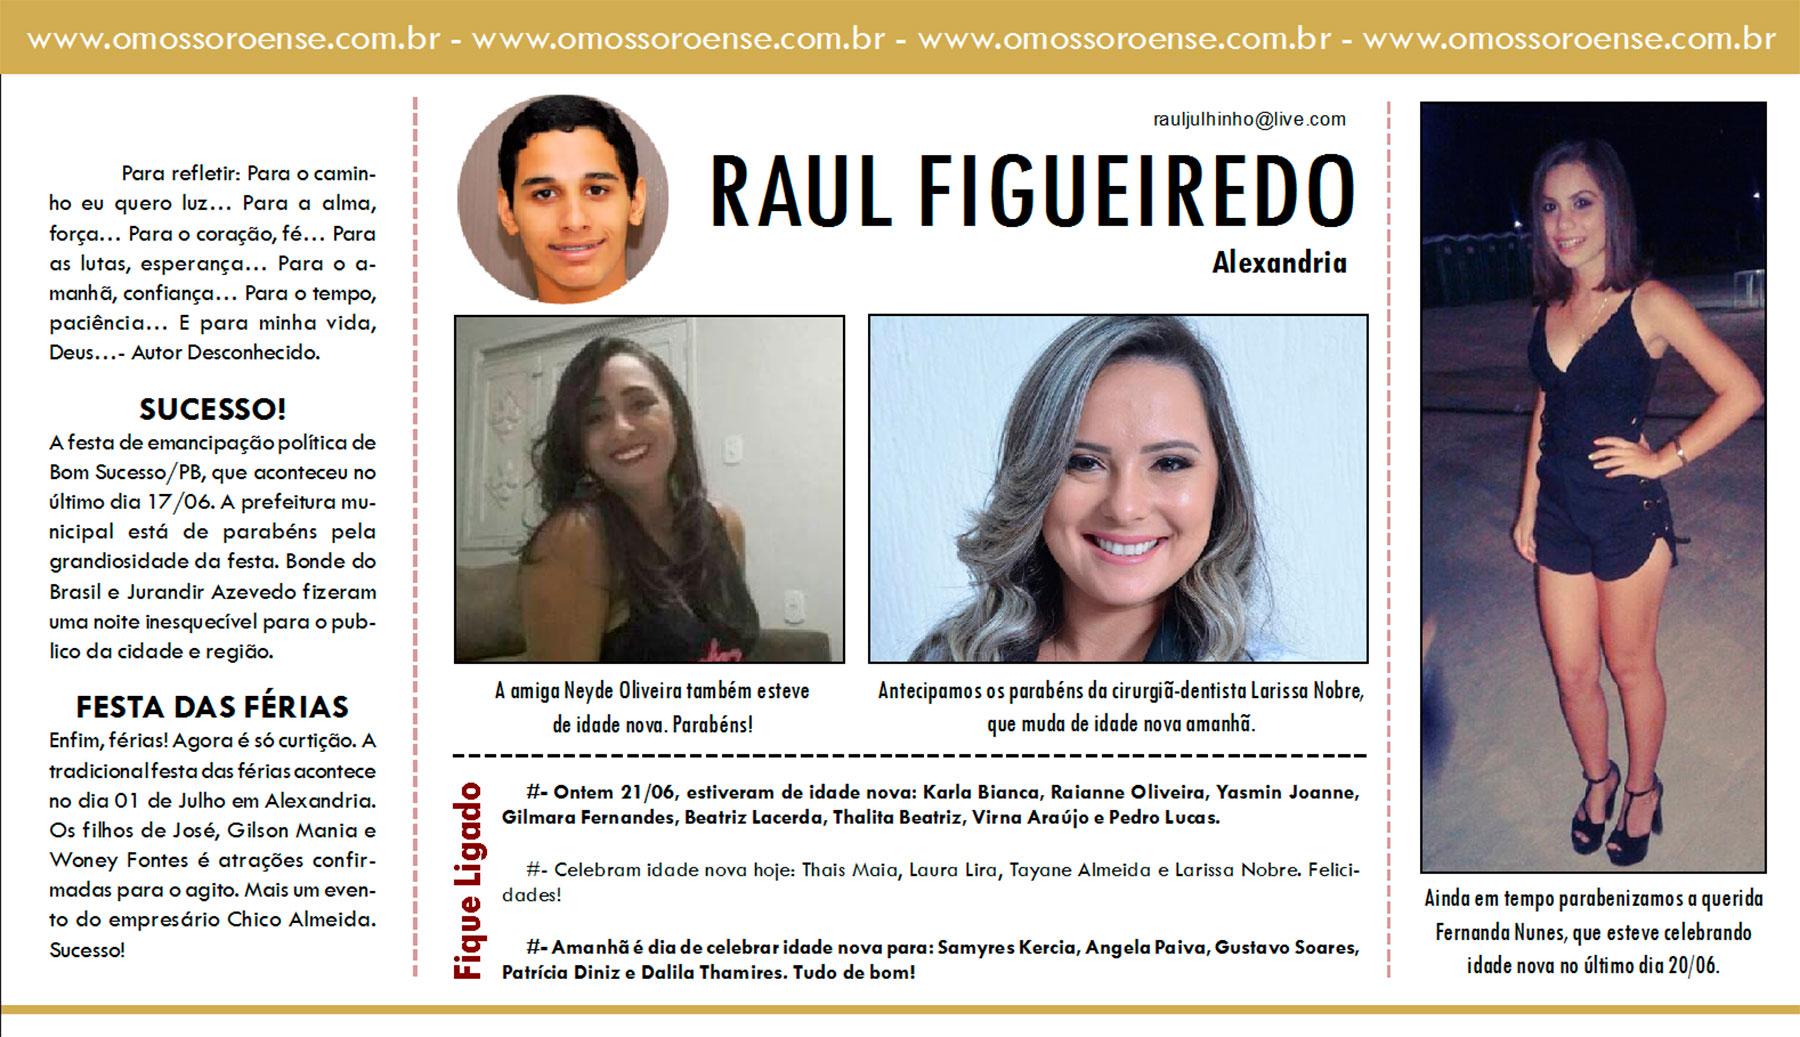 RAUL-FIGUEIREDO---21-06-2016